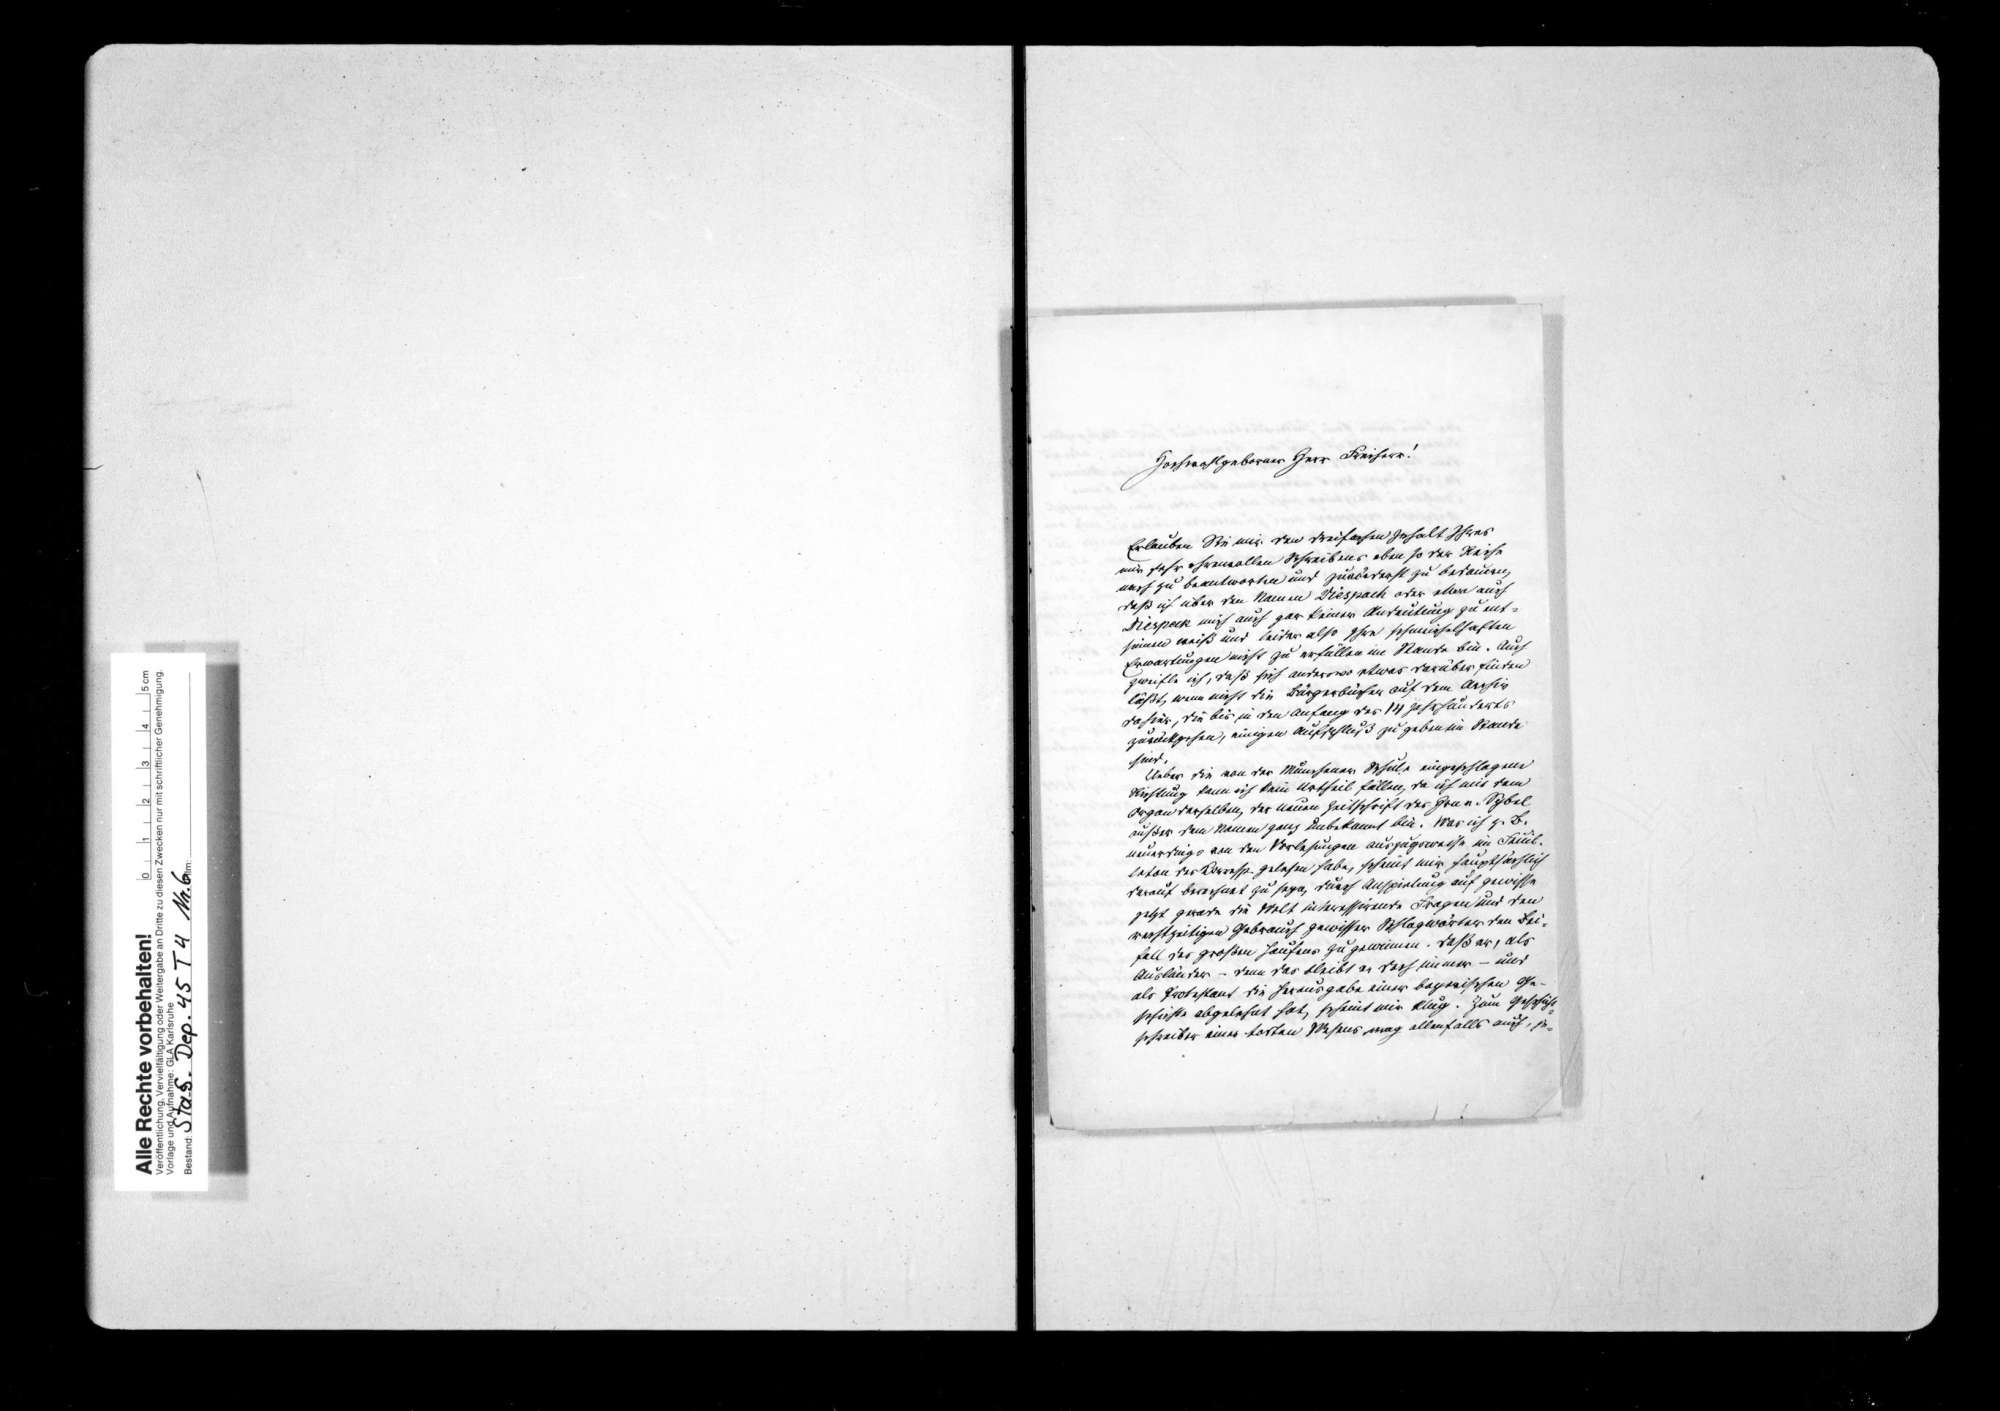 Korrespondenz VI Lochner-R, Bild 3